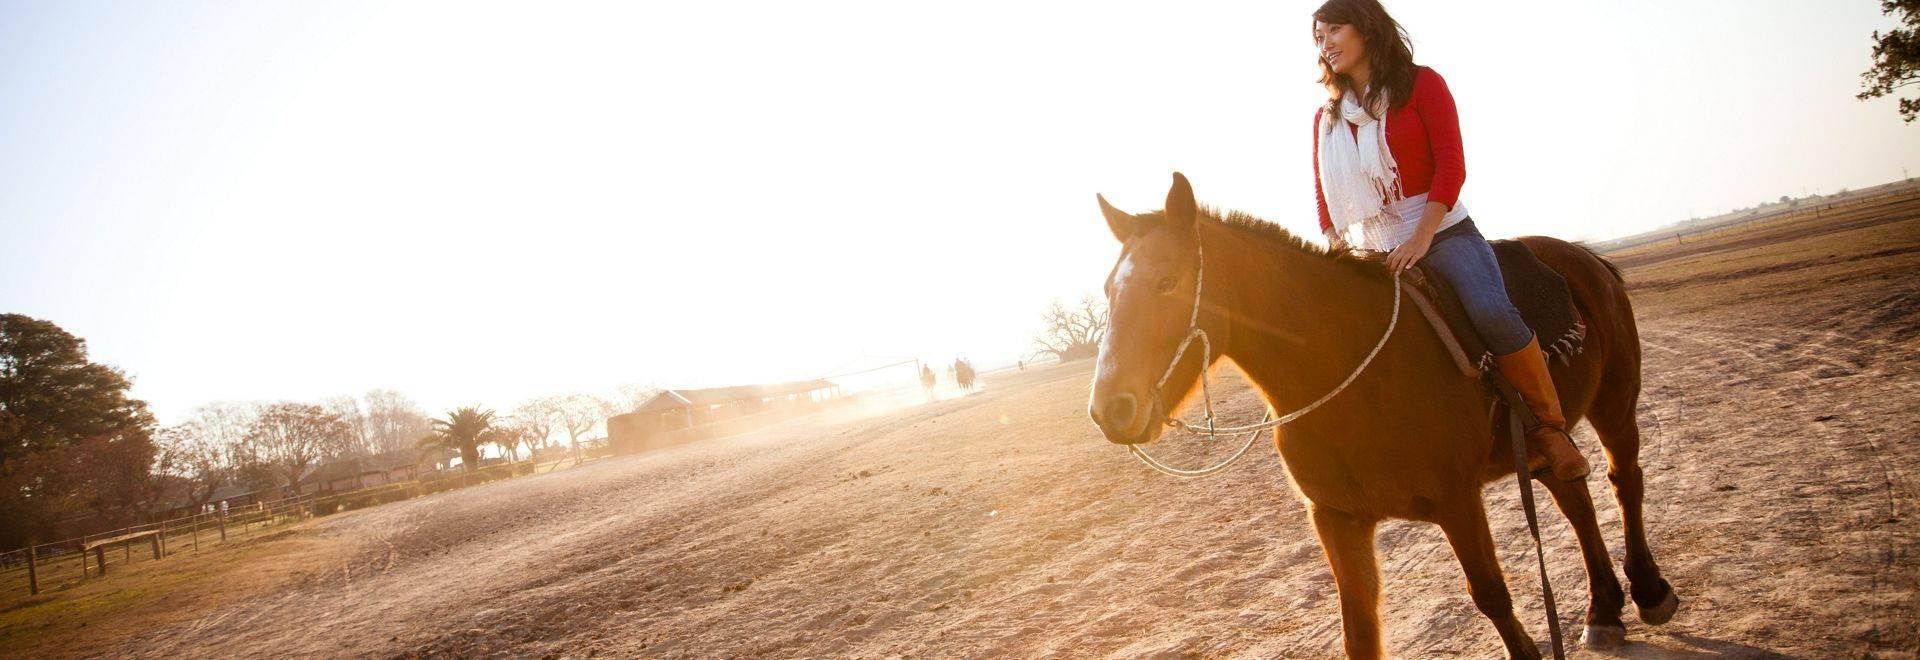 Argentina Buenos Aires Horse Ranch Sunset Traveller Rose-Attit Patel 2012-MG9241 Lg RGB.jpg